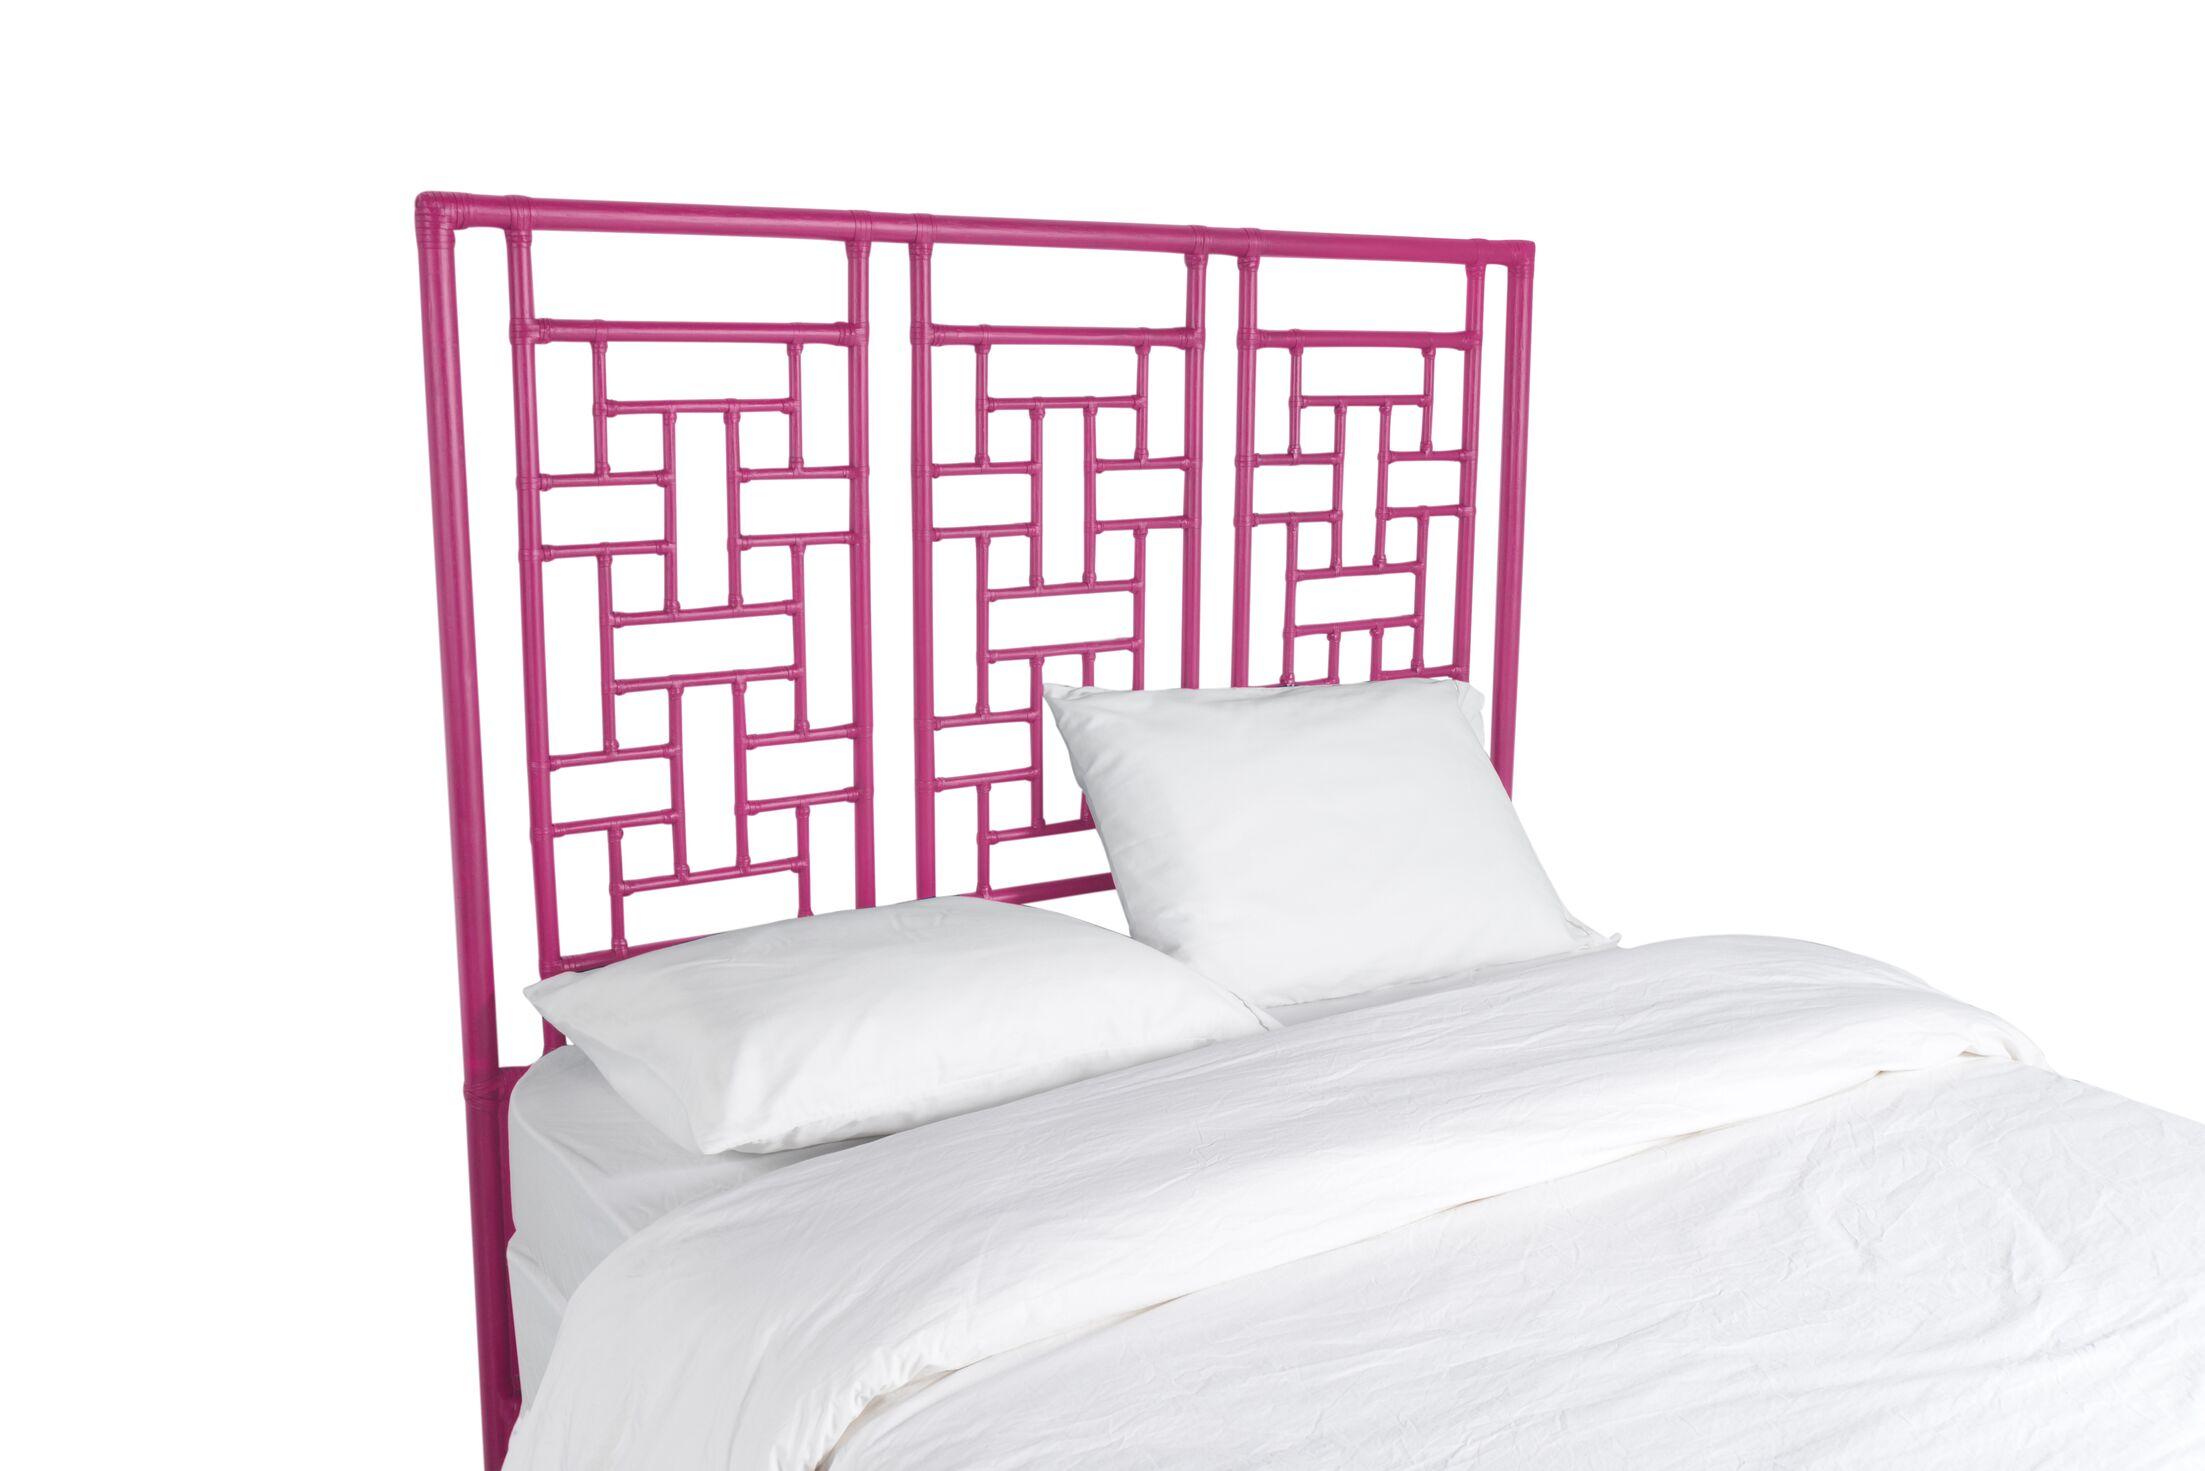 Ohana Open-Frame Headboard Color: Hot Pink, Size: King